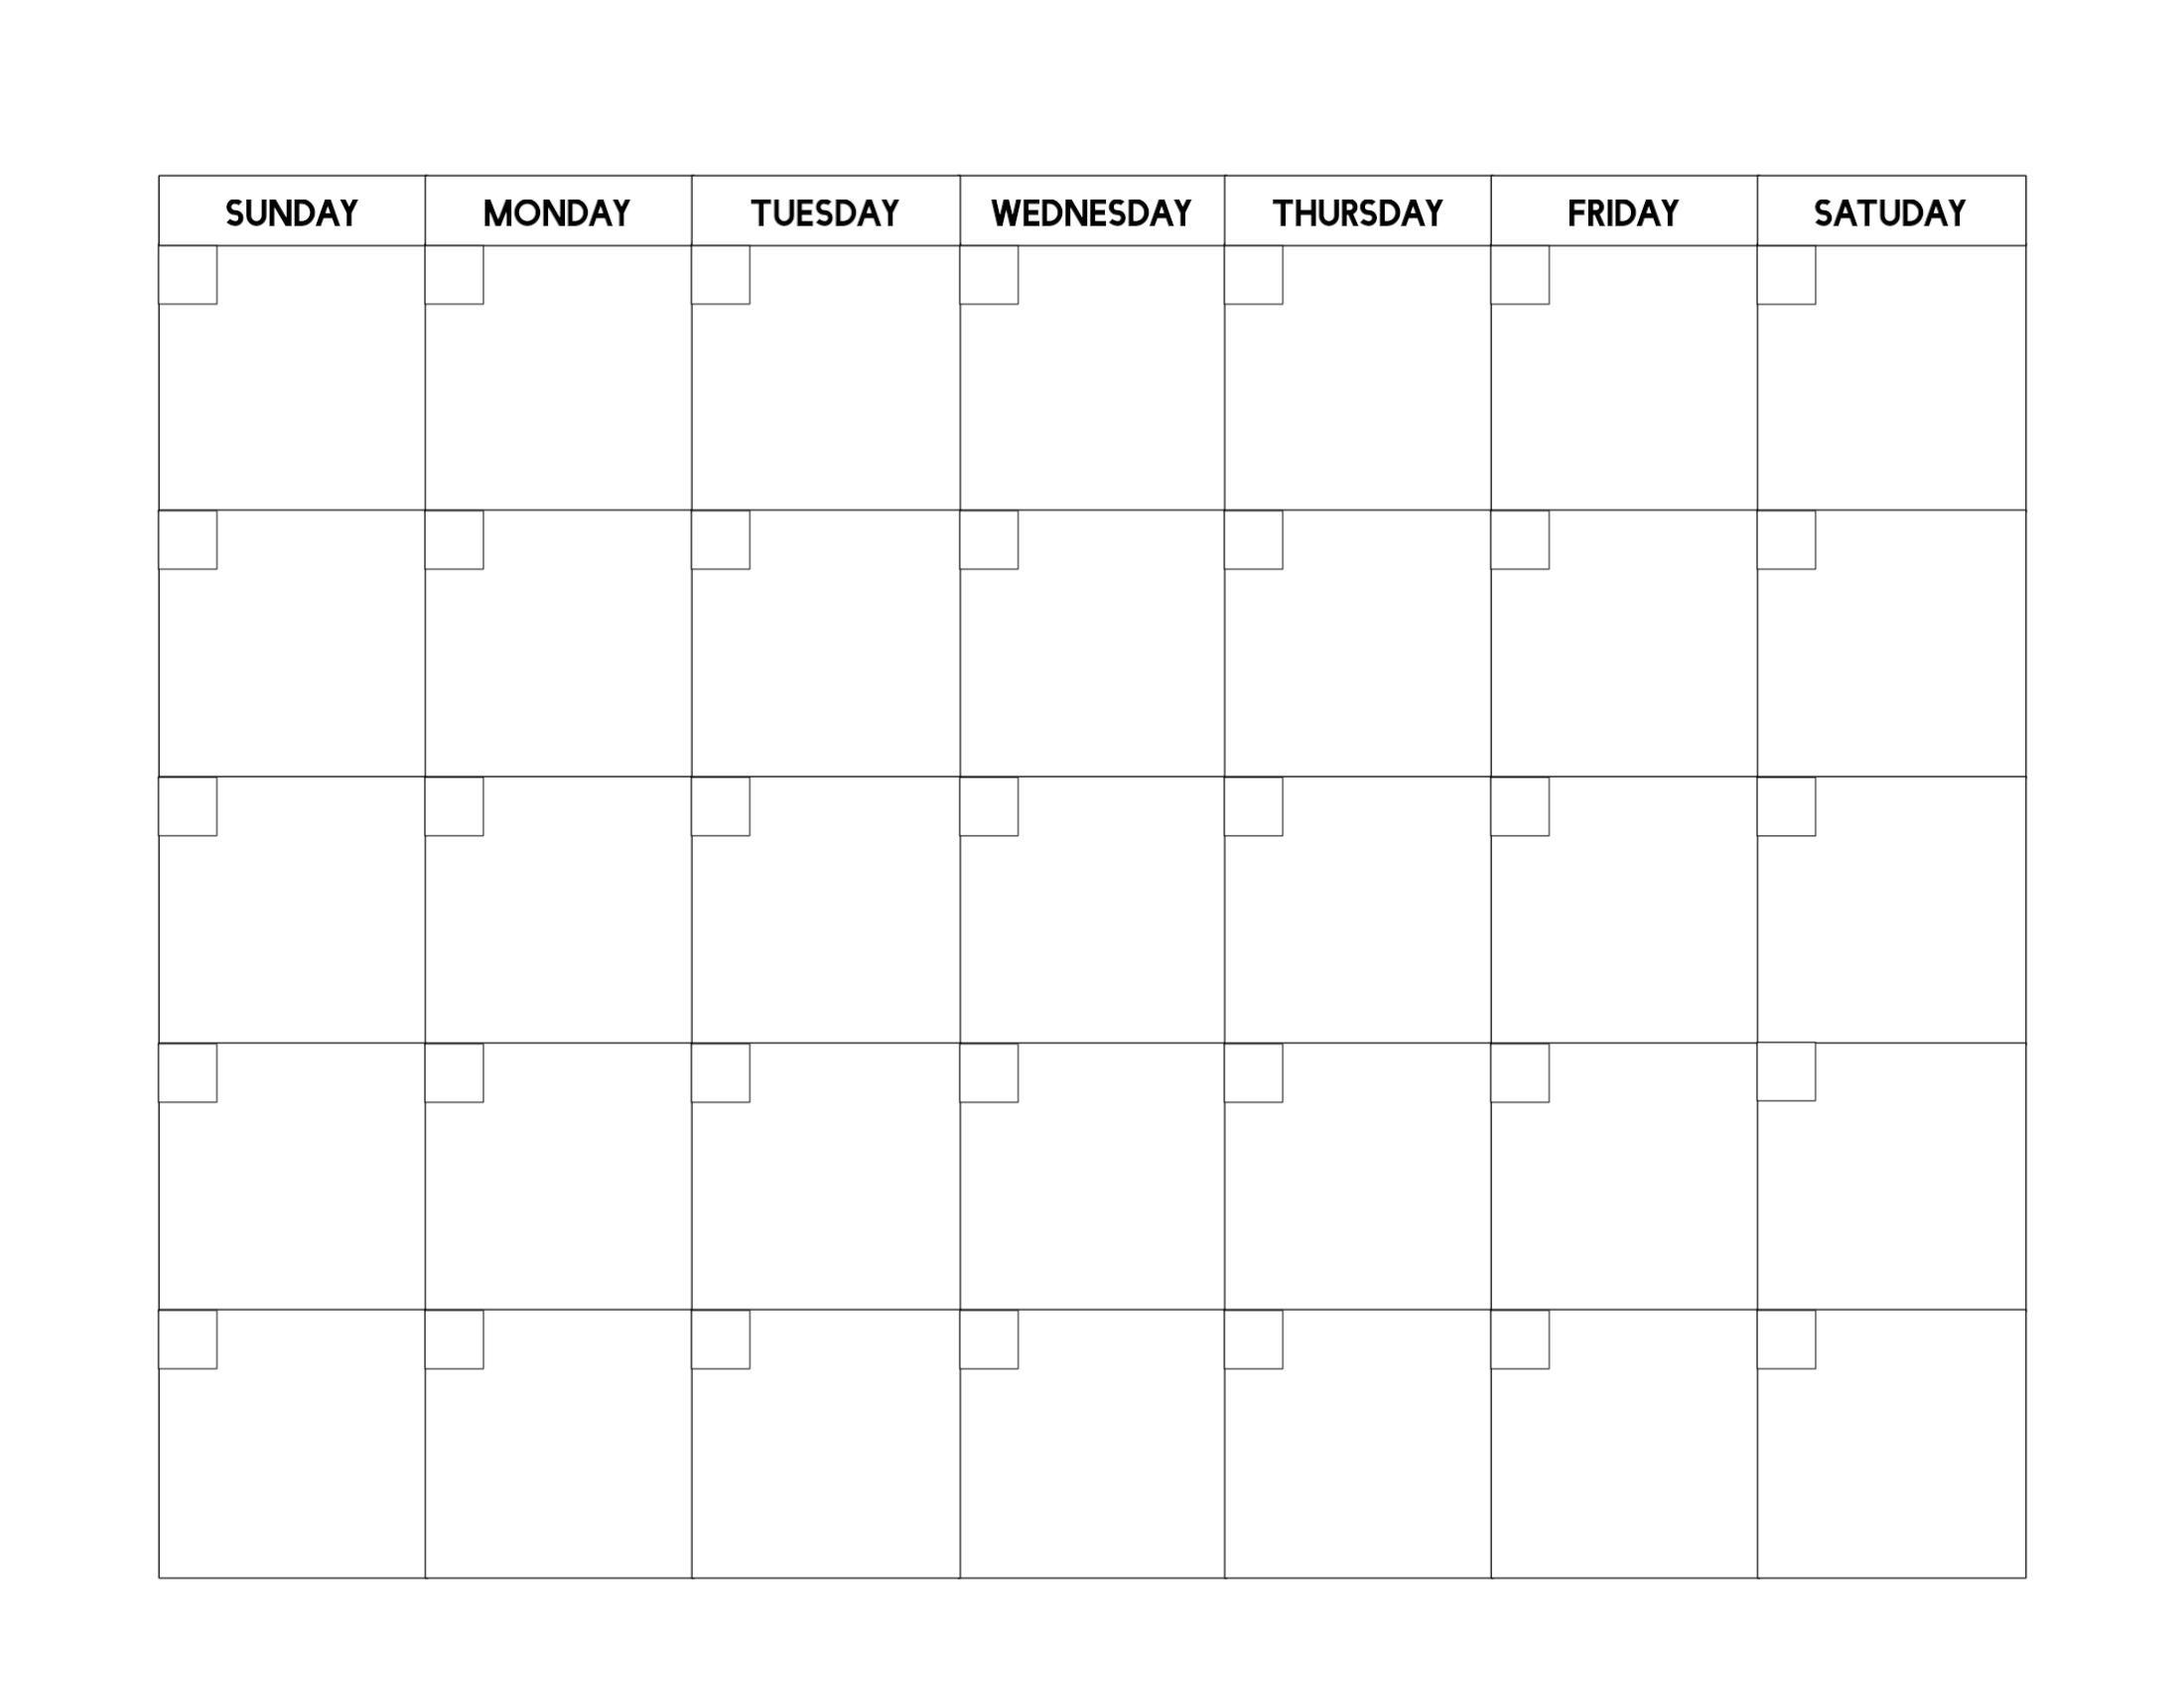 Free Printable Blank Calendar Template - Paper Trail Design